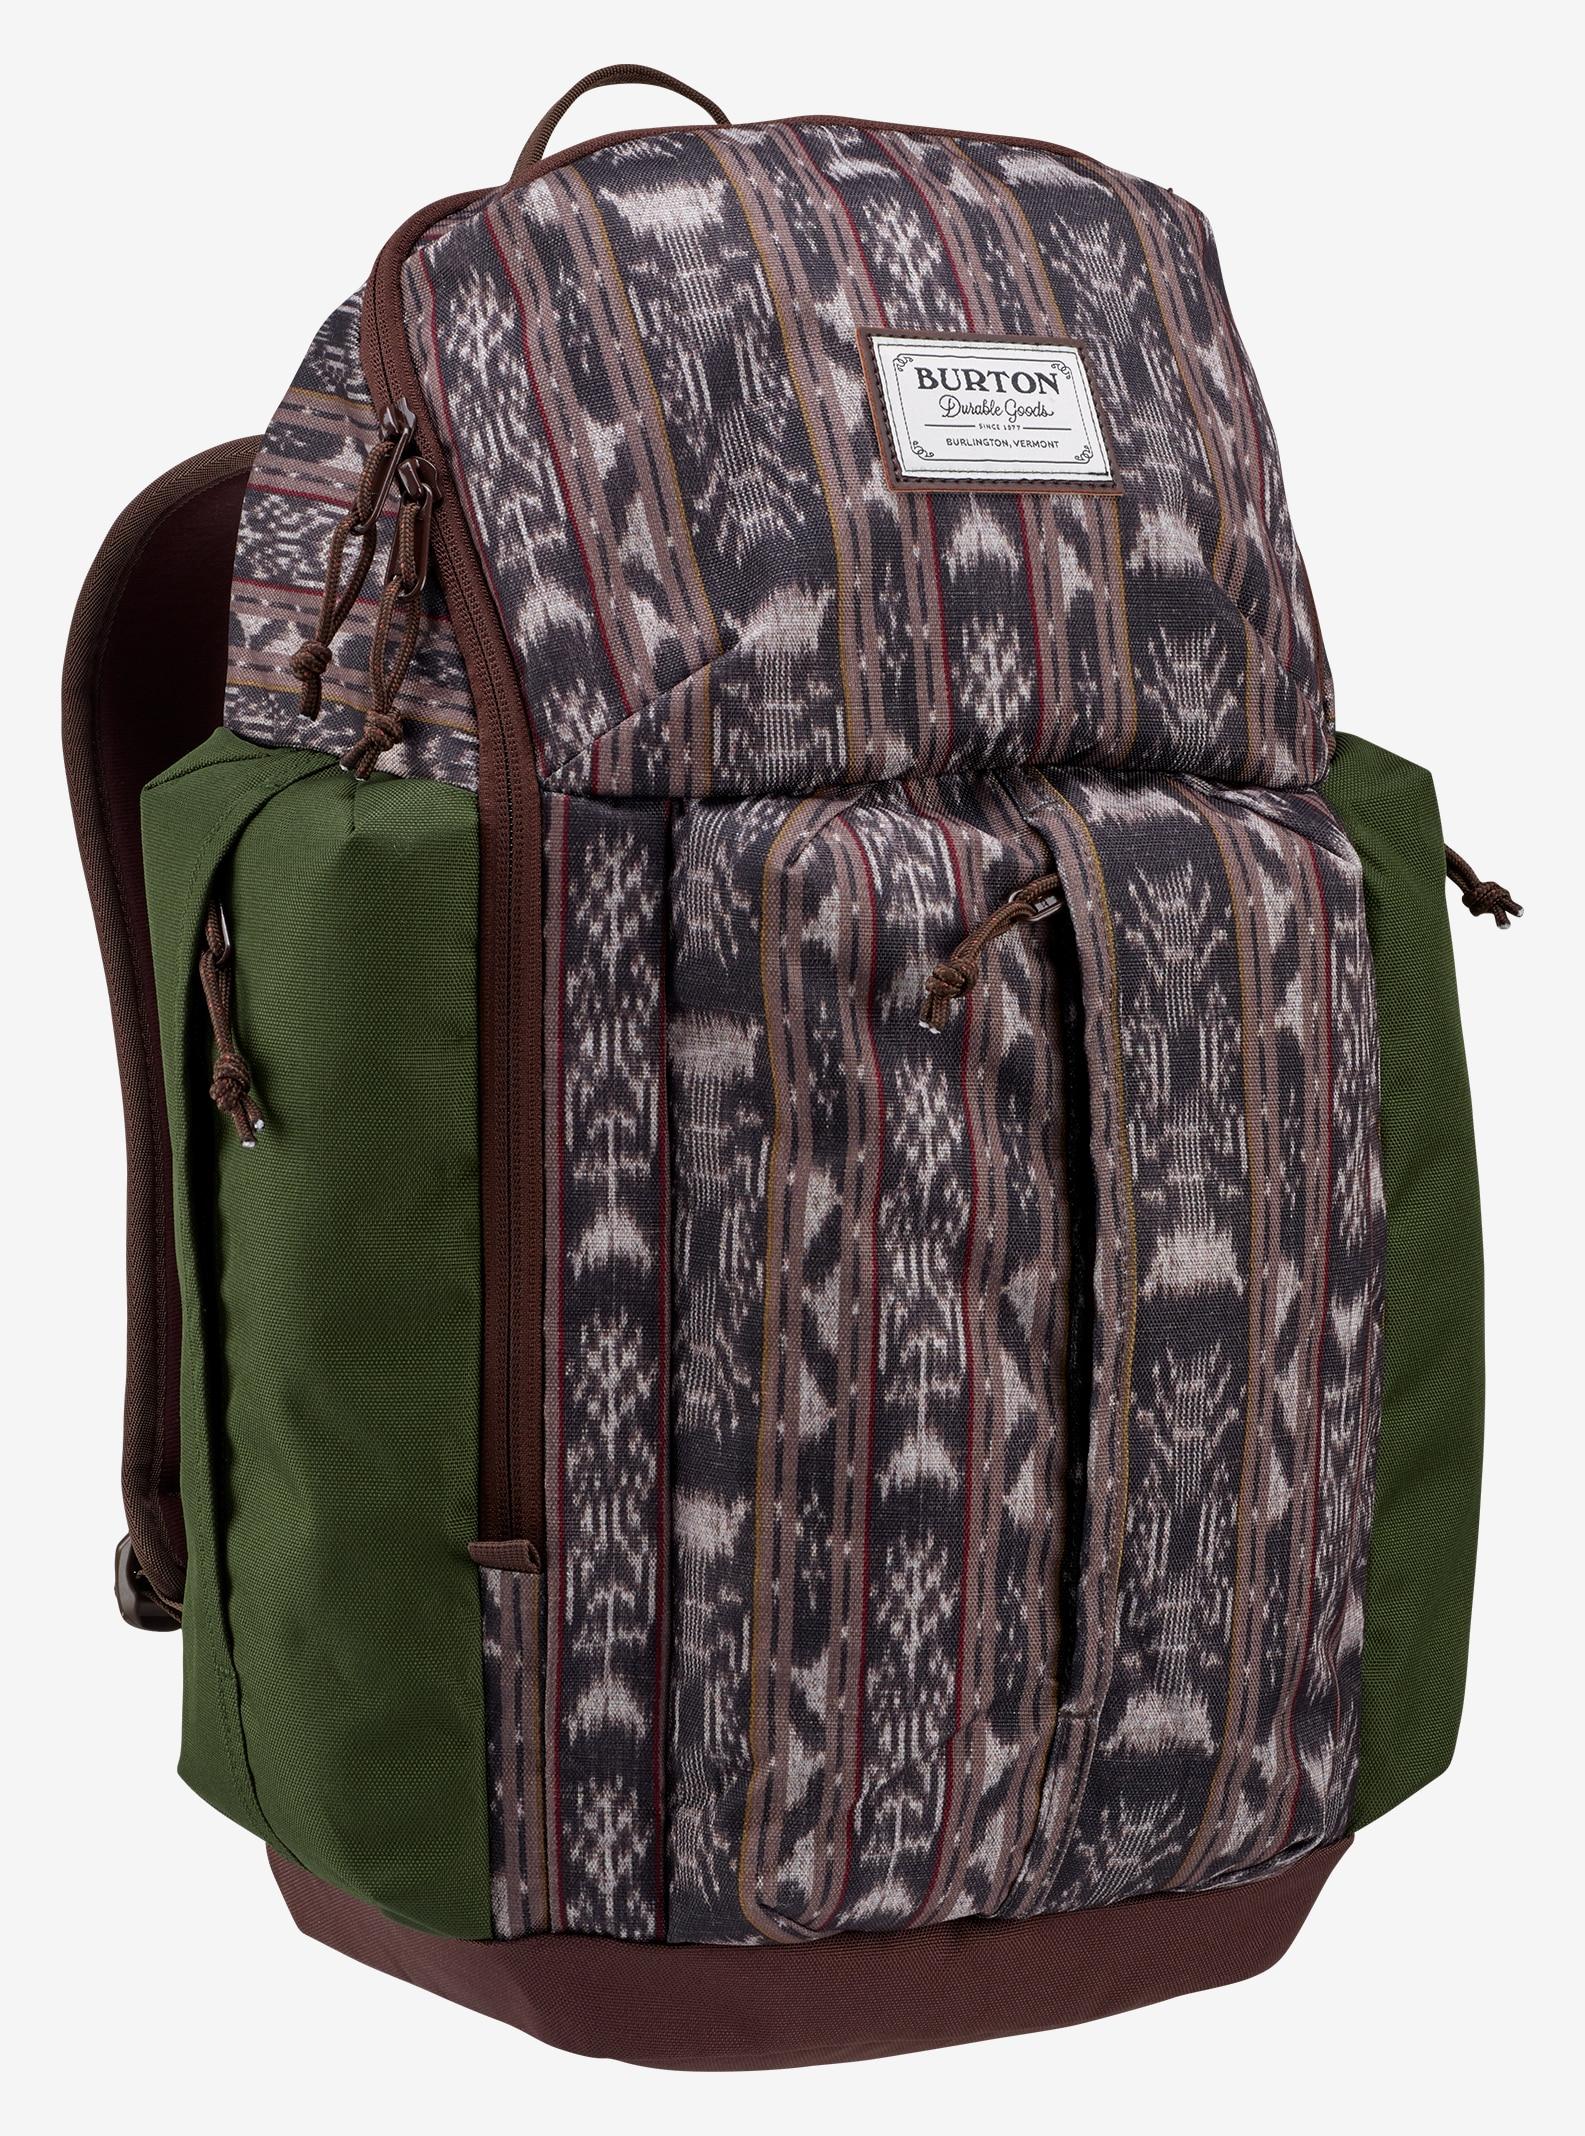 Burton Cadet Backpack shown in Guatikat Print